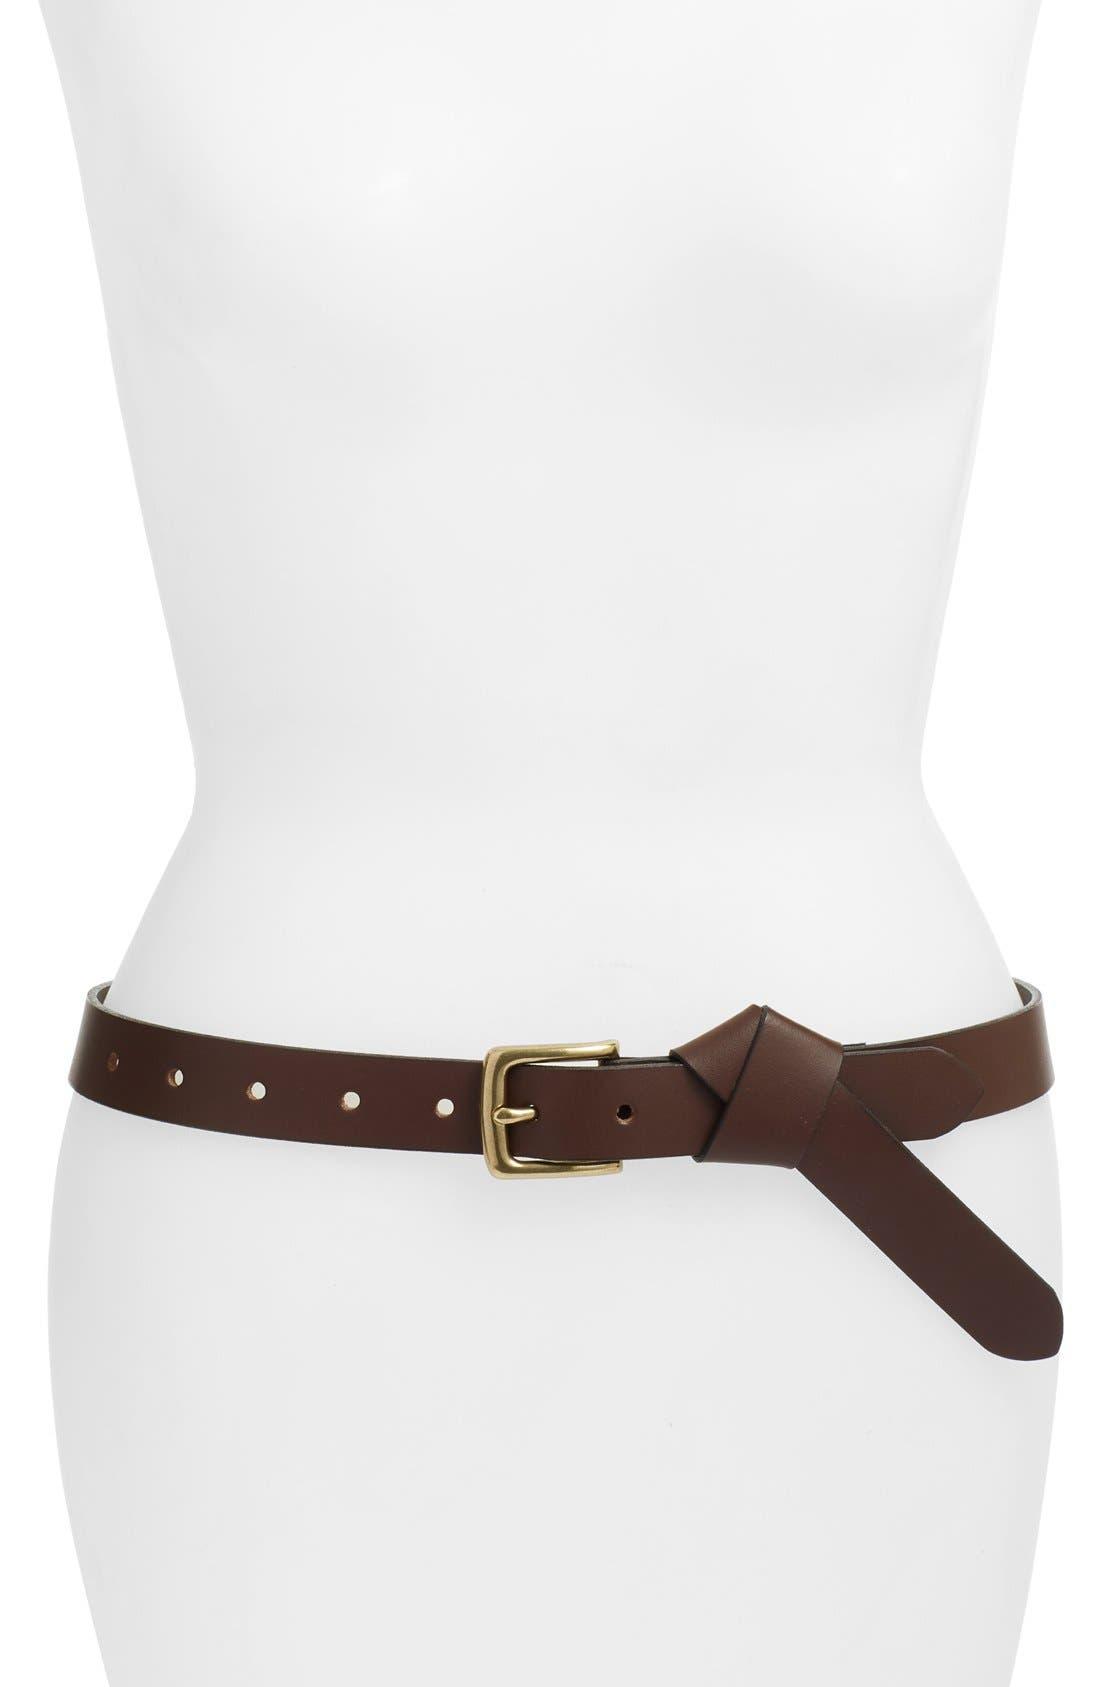 Main Image - Treasure&Bond Knotted Leather Belt